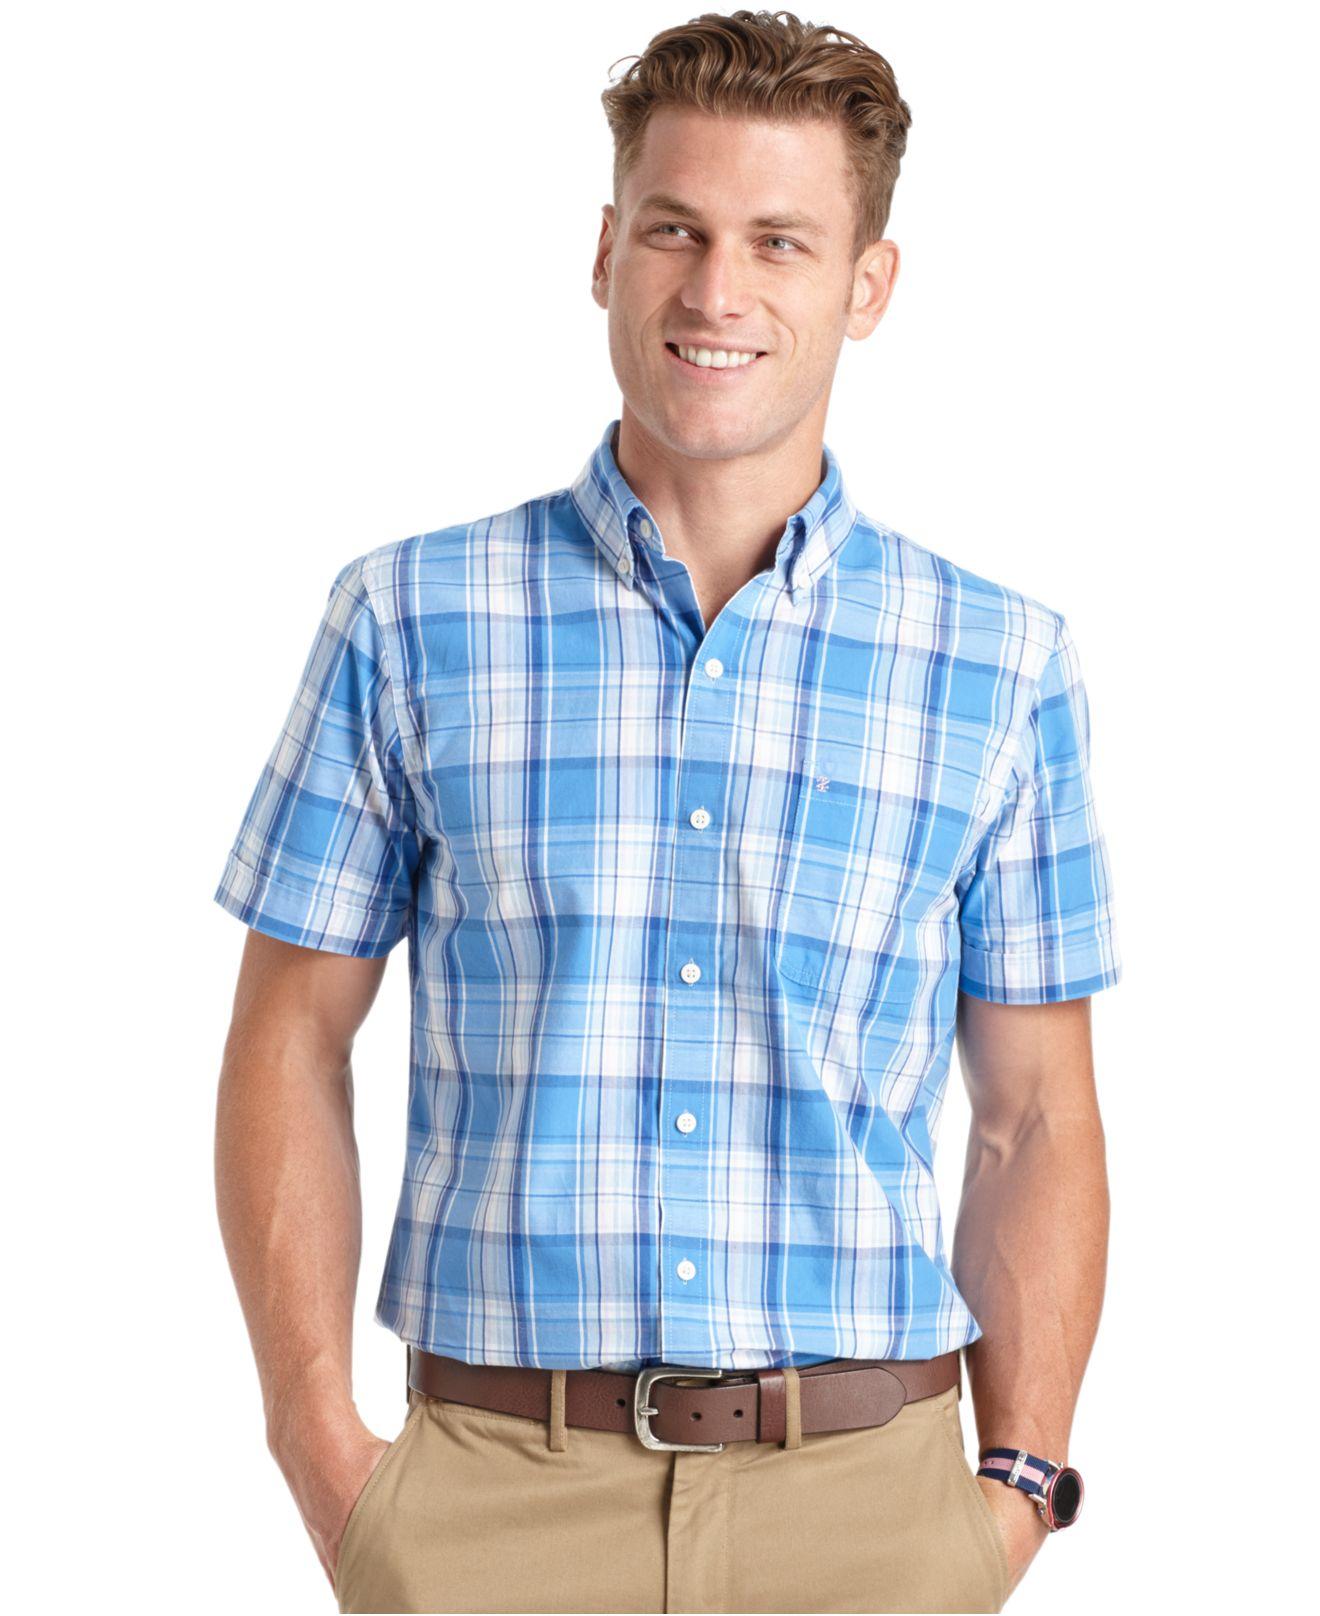 Lyst izod big and tall large plaid short sleeve shirt in for Izod big and tall shirts